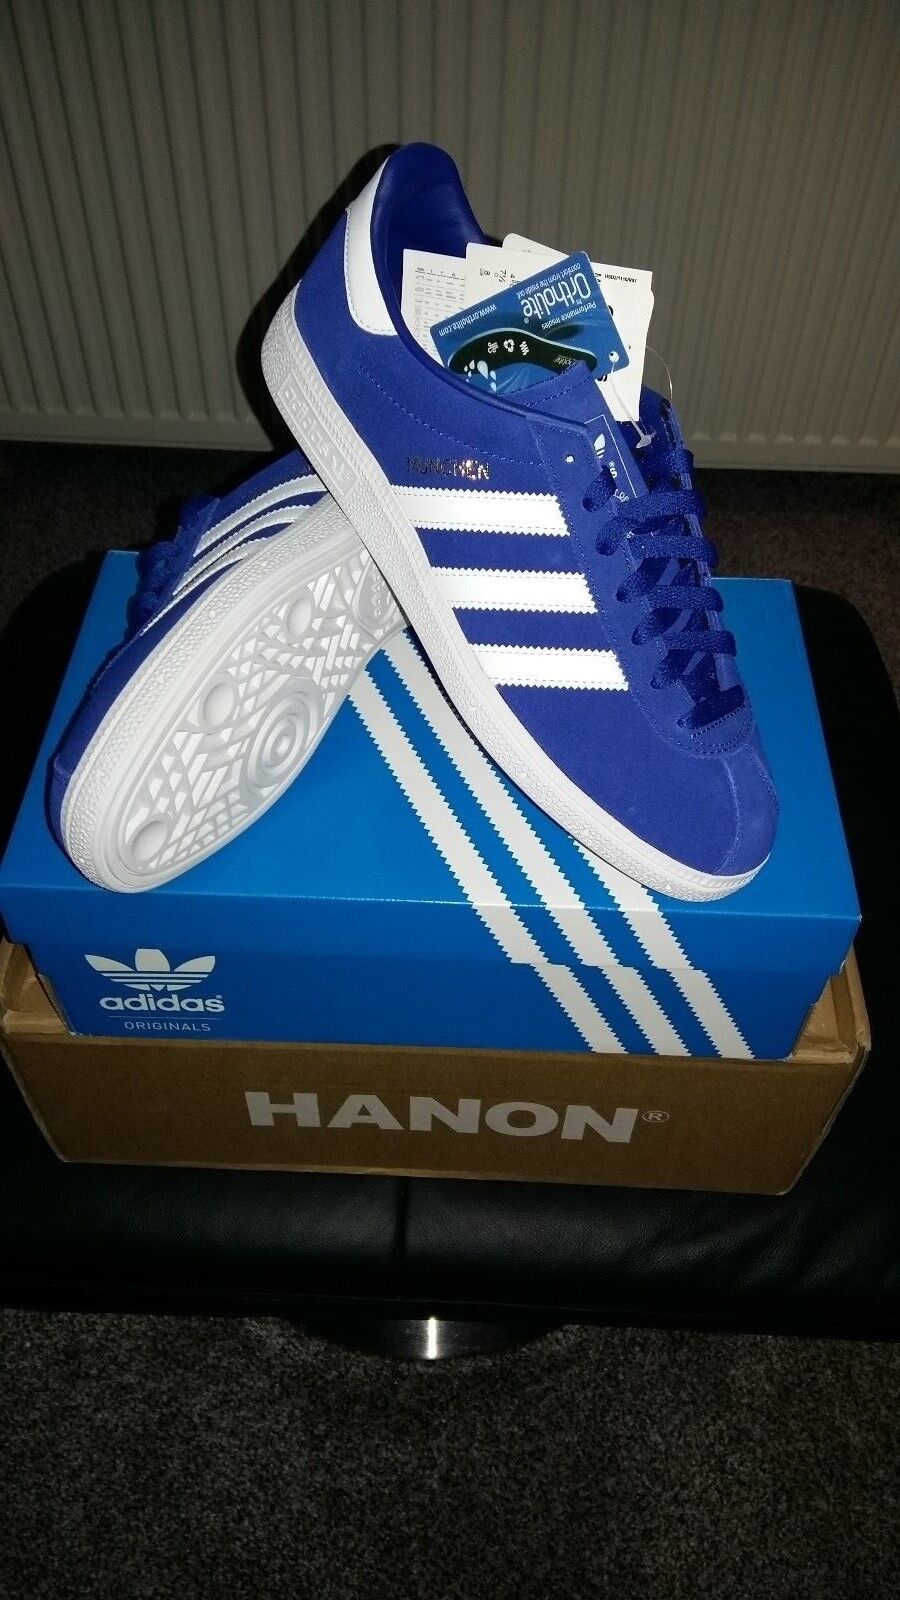 Adidas Munchen... Old School Unisexe Baskets... Taille 7.5 UK 41 1/3 EUR